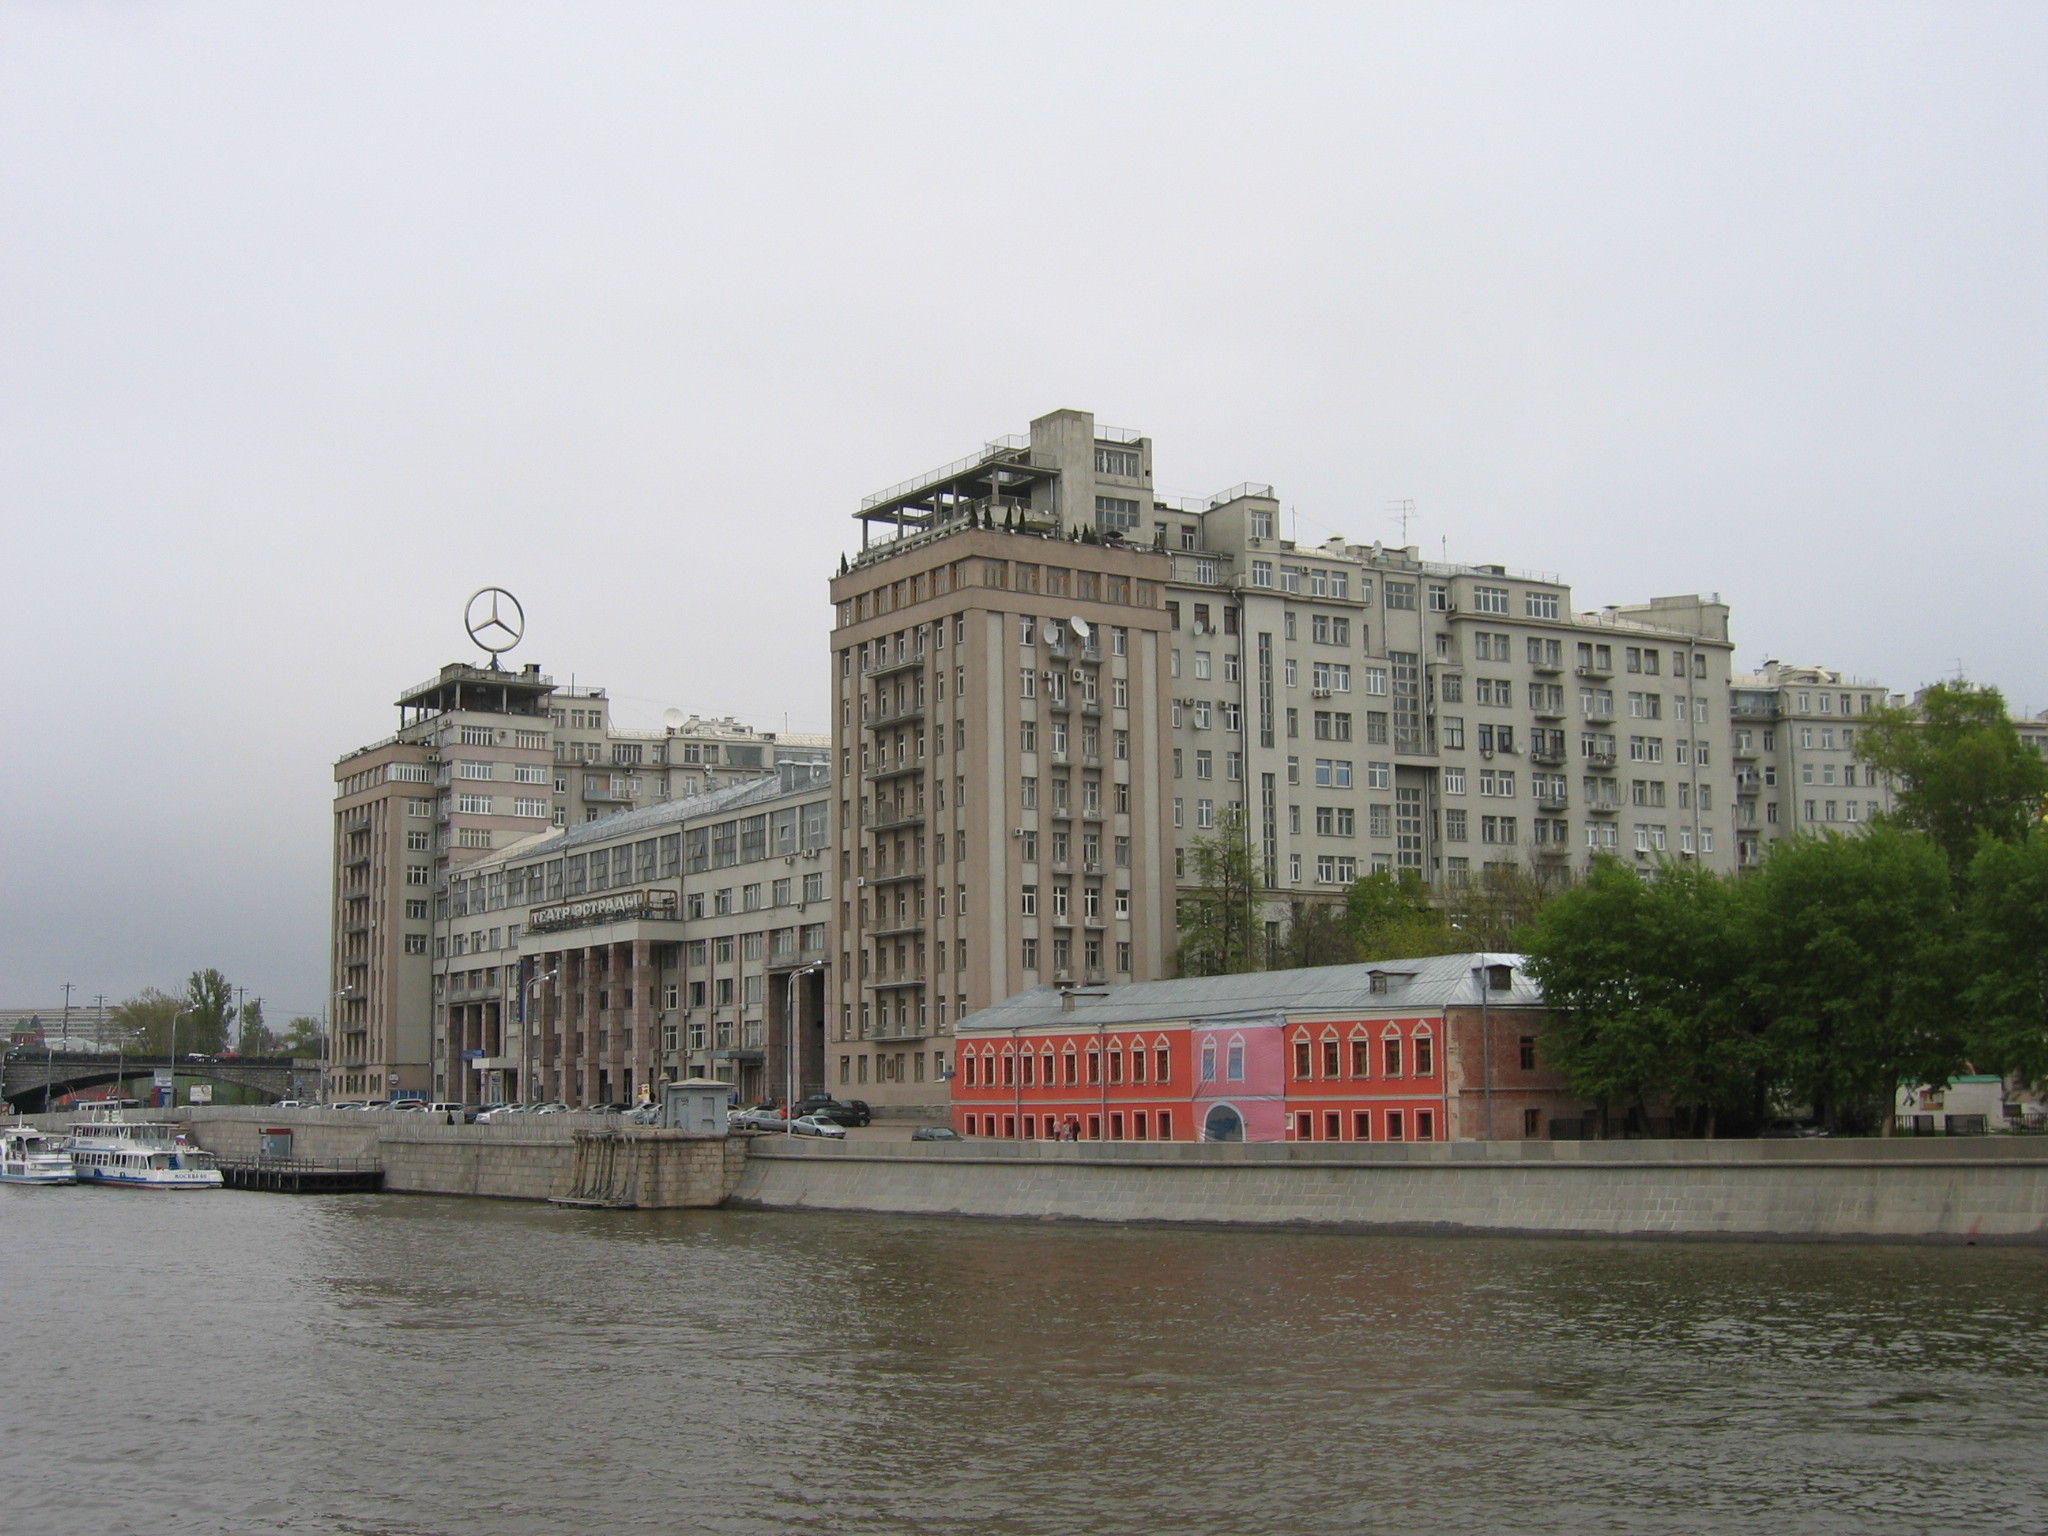 http://upload.wikimedia.org/wikipedia/commons/a/aa/Dom-na-naberezhnoi.jpg